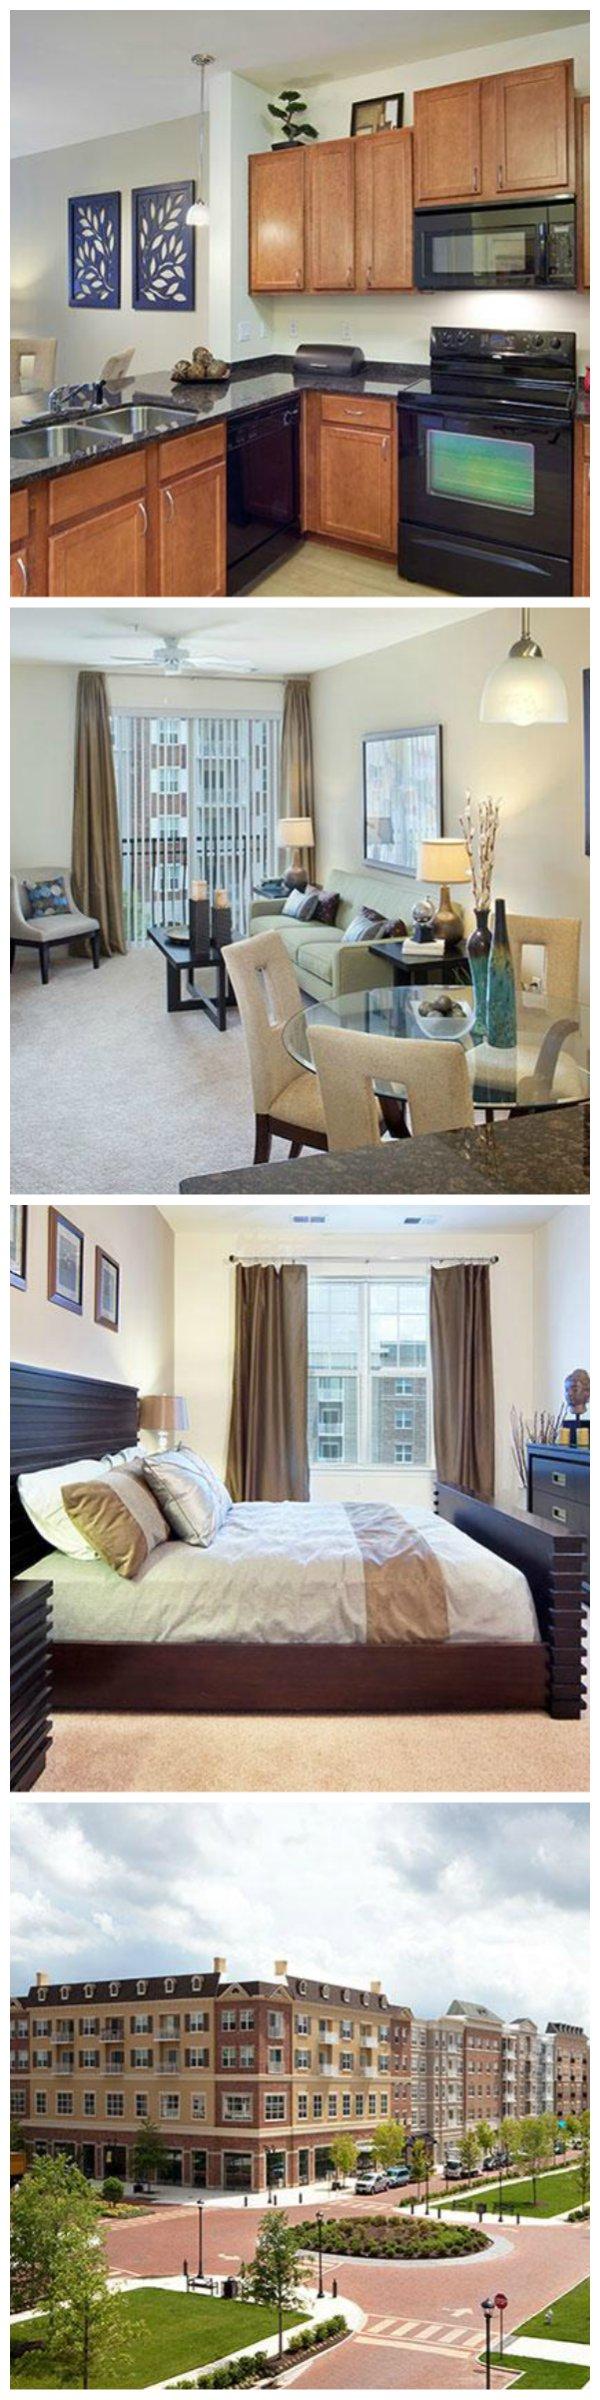 17 Amazing Basement Apartment Floor Plans In Cool Download